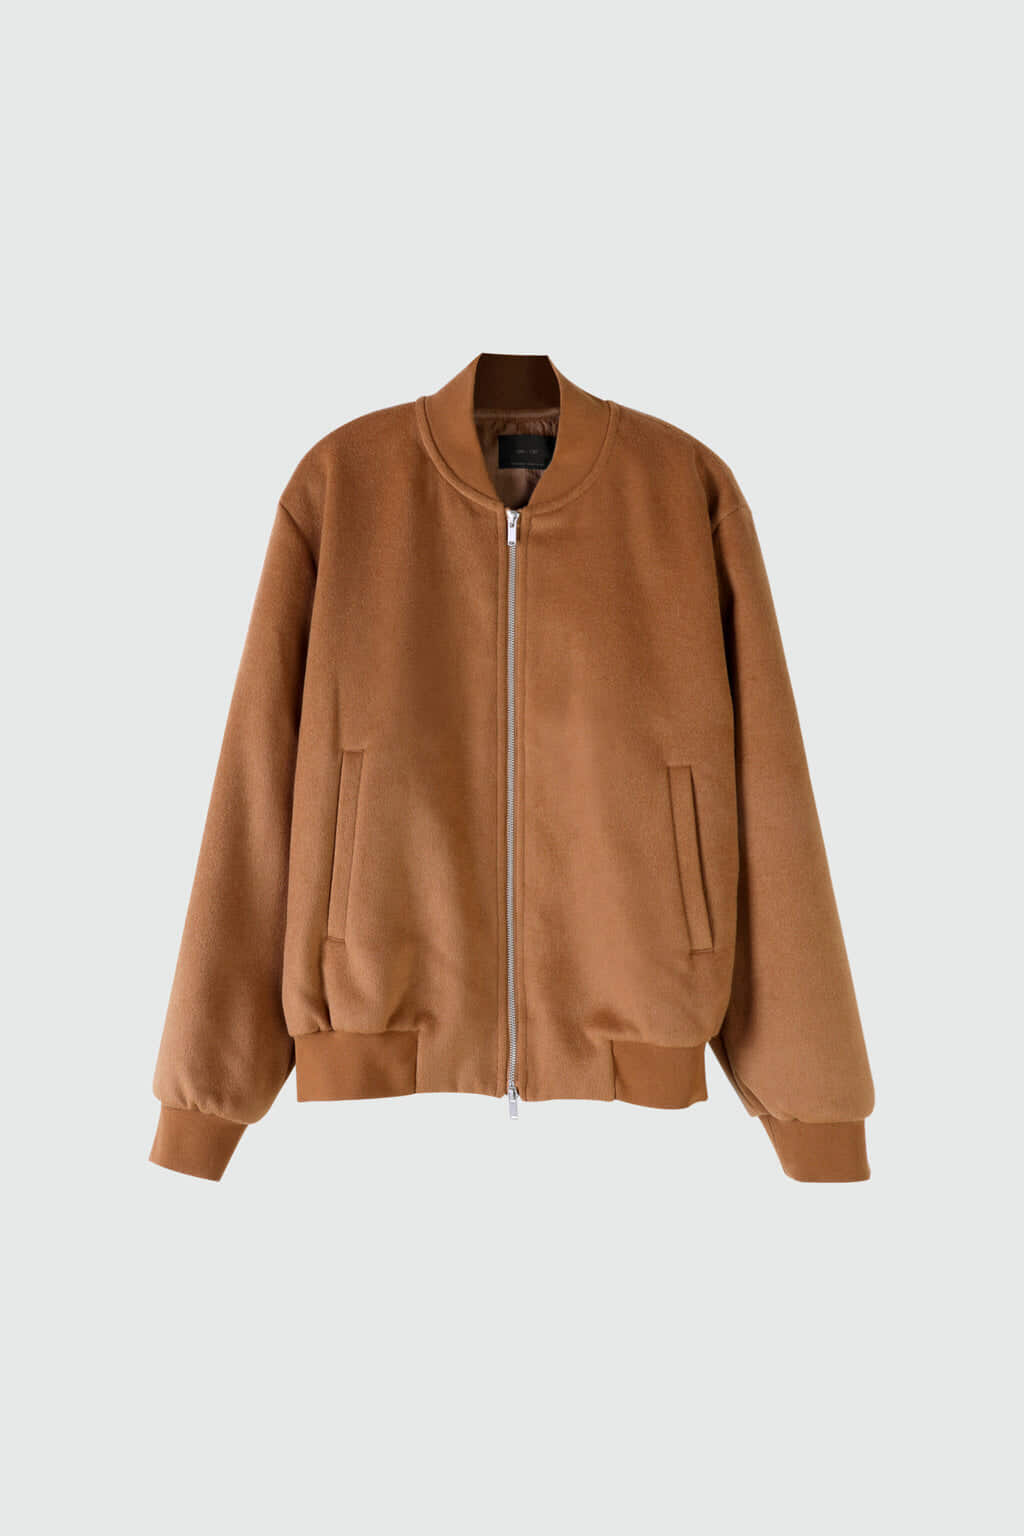 Jacket 2478 Camel 5